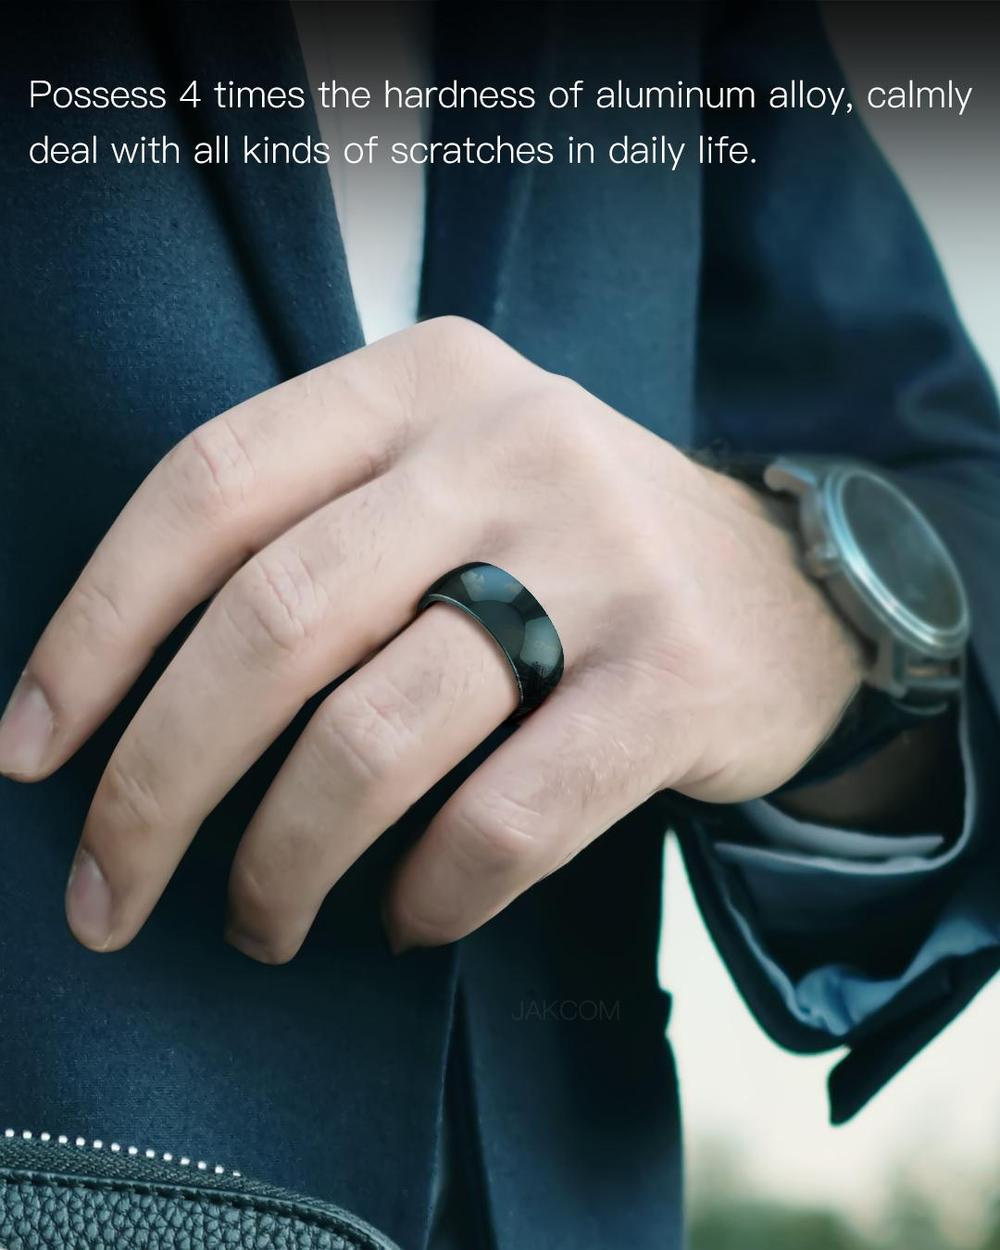 mibro ar smartwatch chip n5000 relógio 6